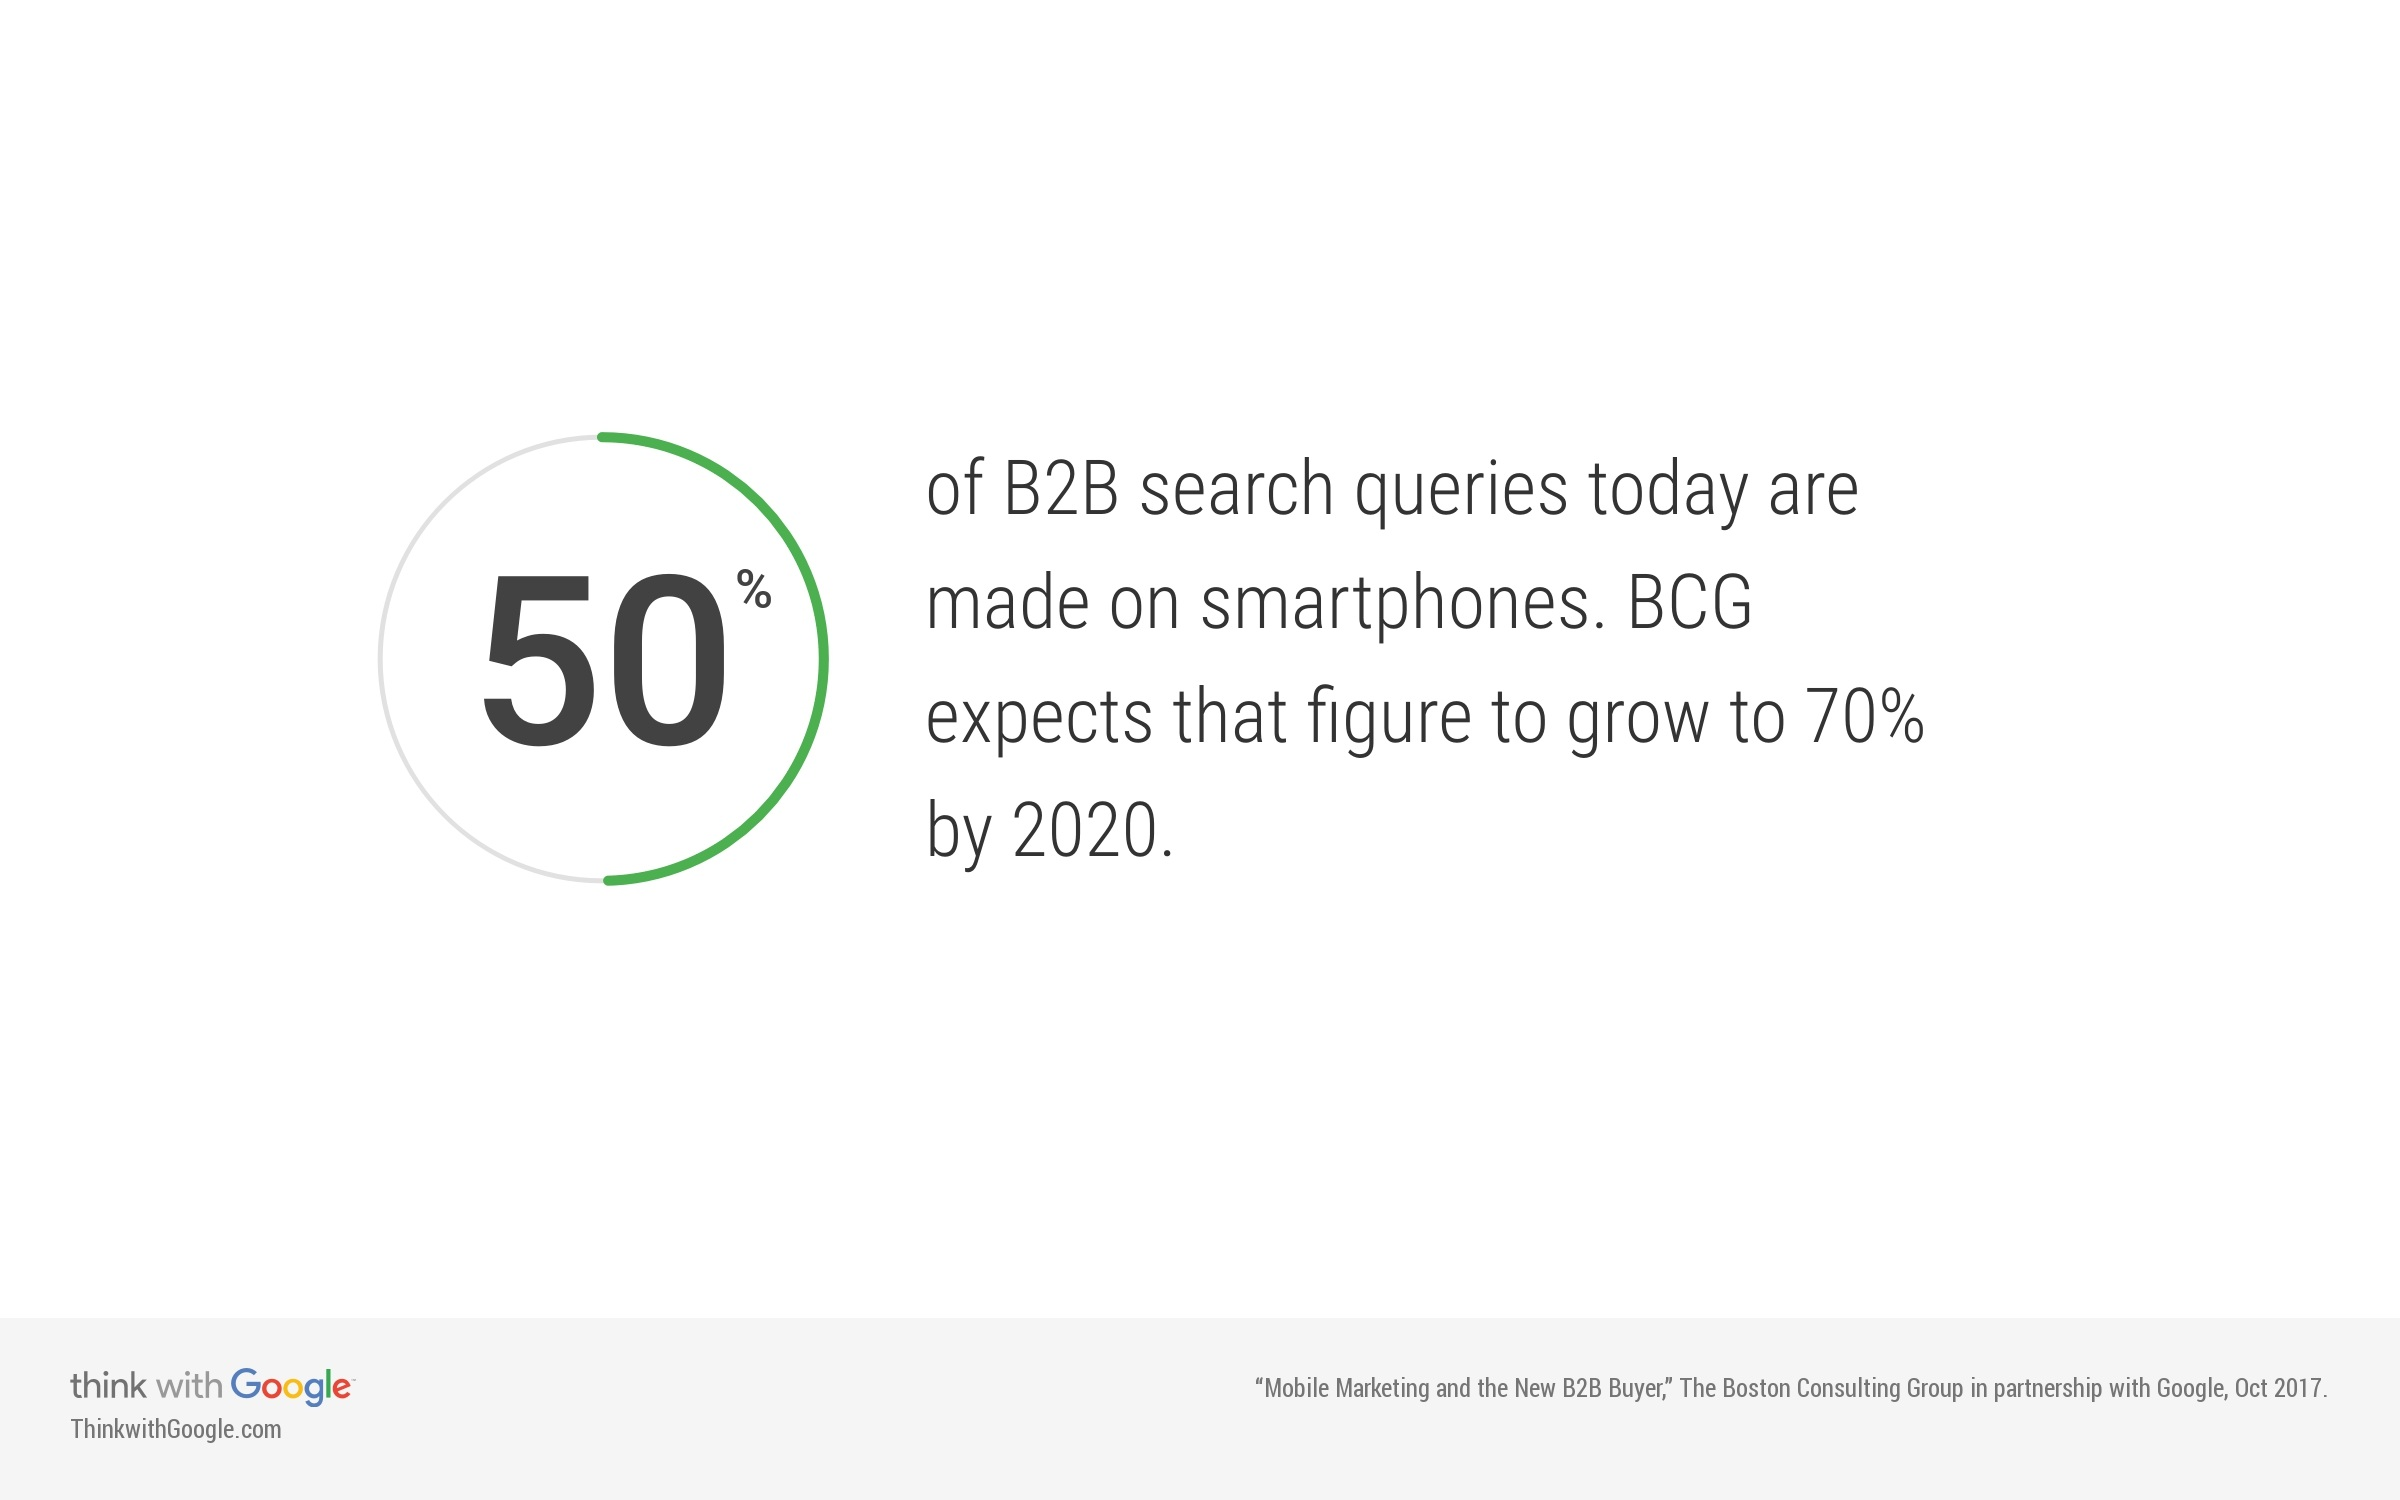 B2B mobile search queries